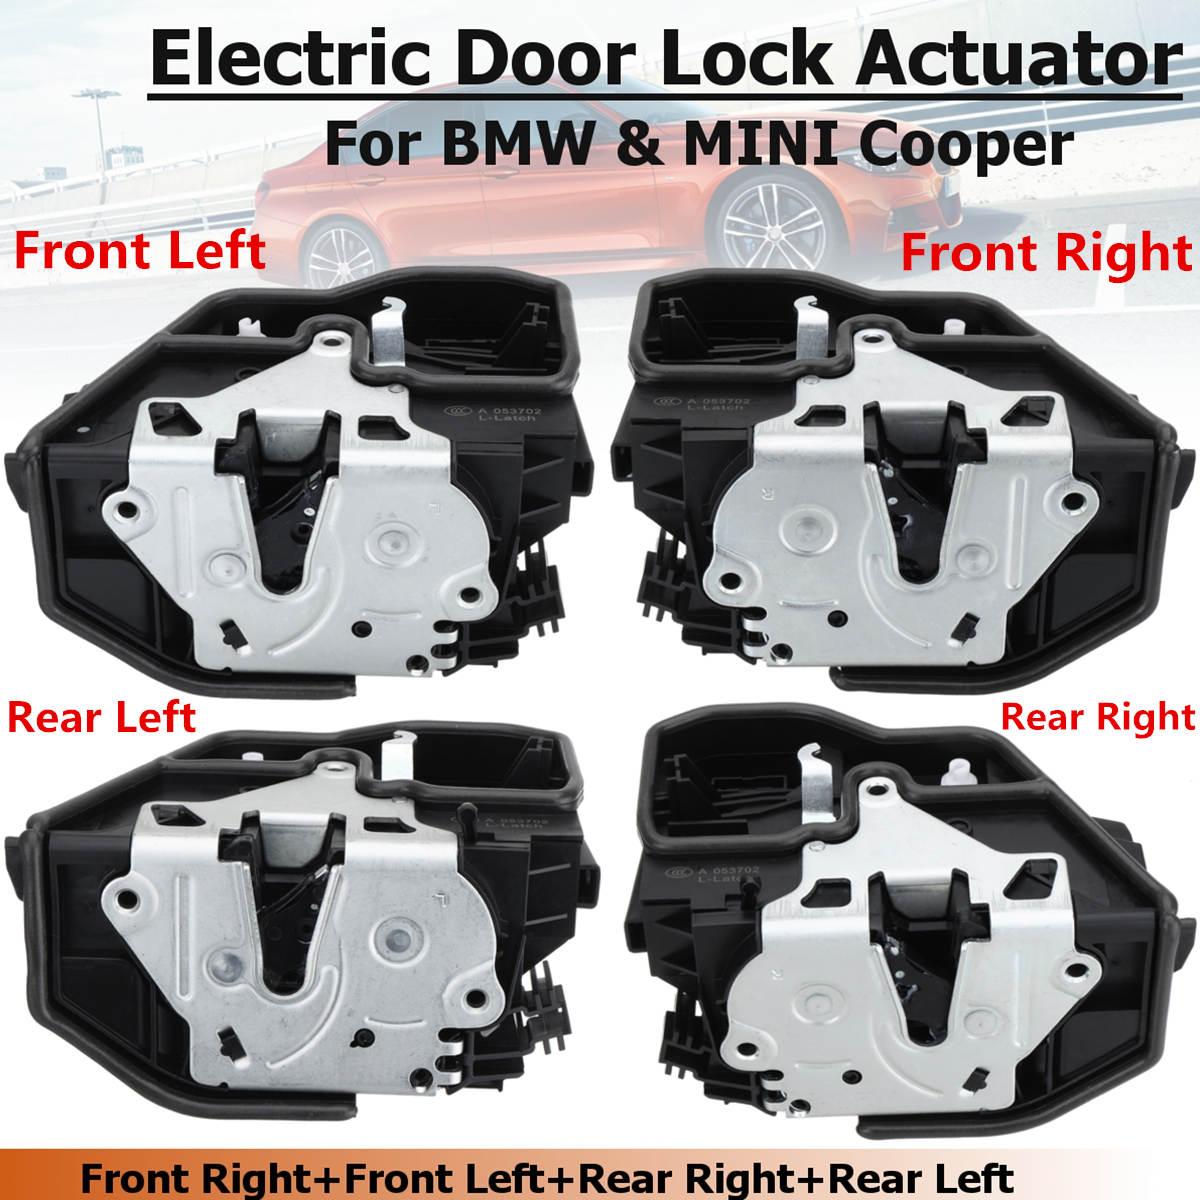 Power Electric Door Lock Latch Actuator For BMW X6 E60 E70 E90 OEM 51217202143 51217202146 51227202147 51227202148